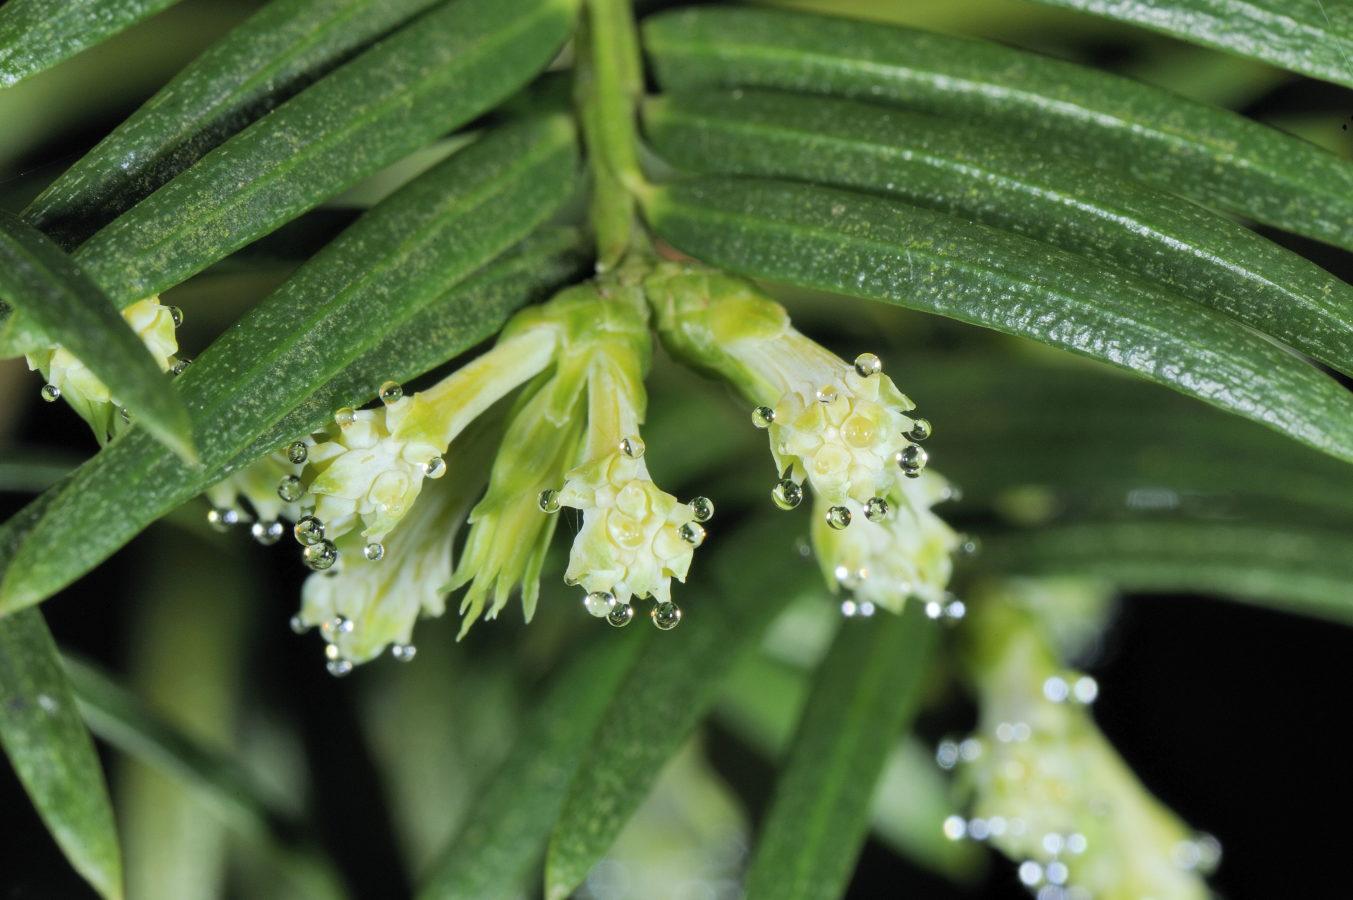 Pollination drops on receptive female 'flowers' (Ruiyan, Taiwan)